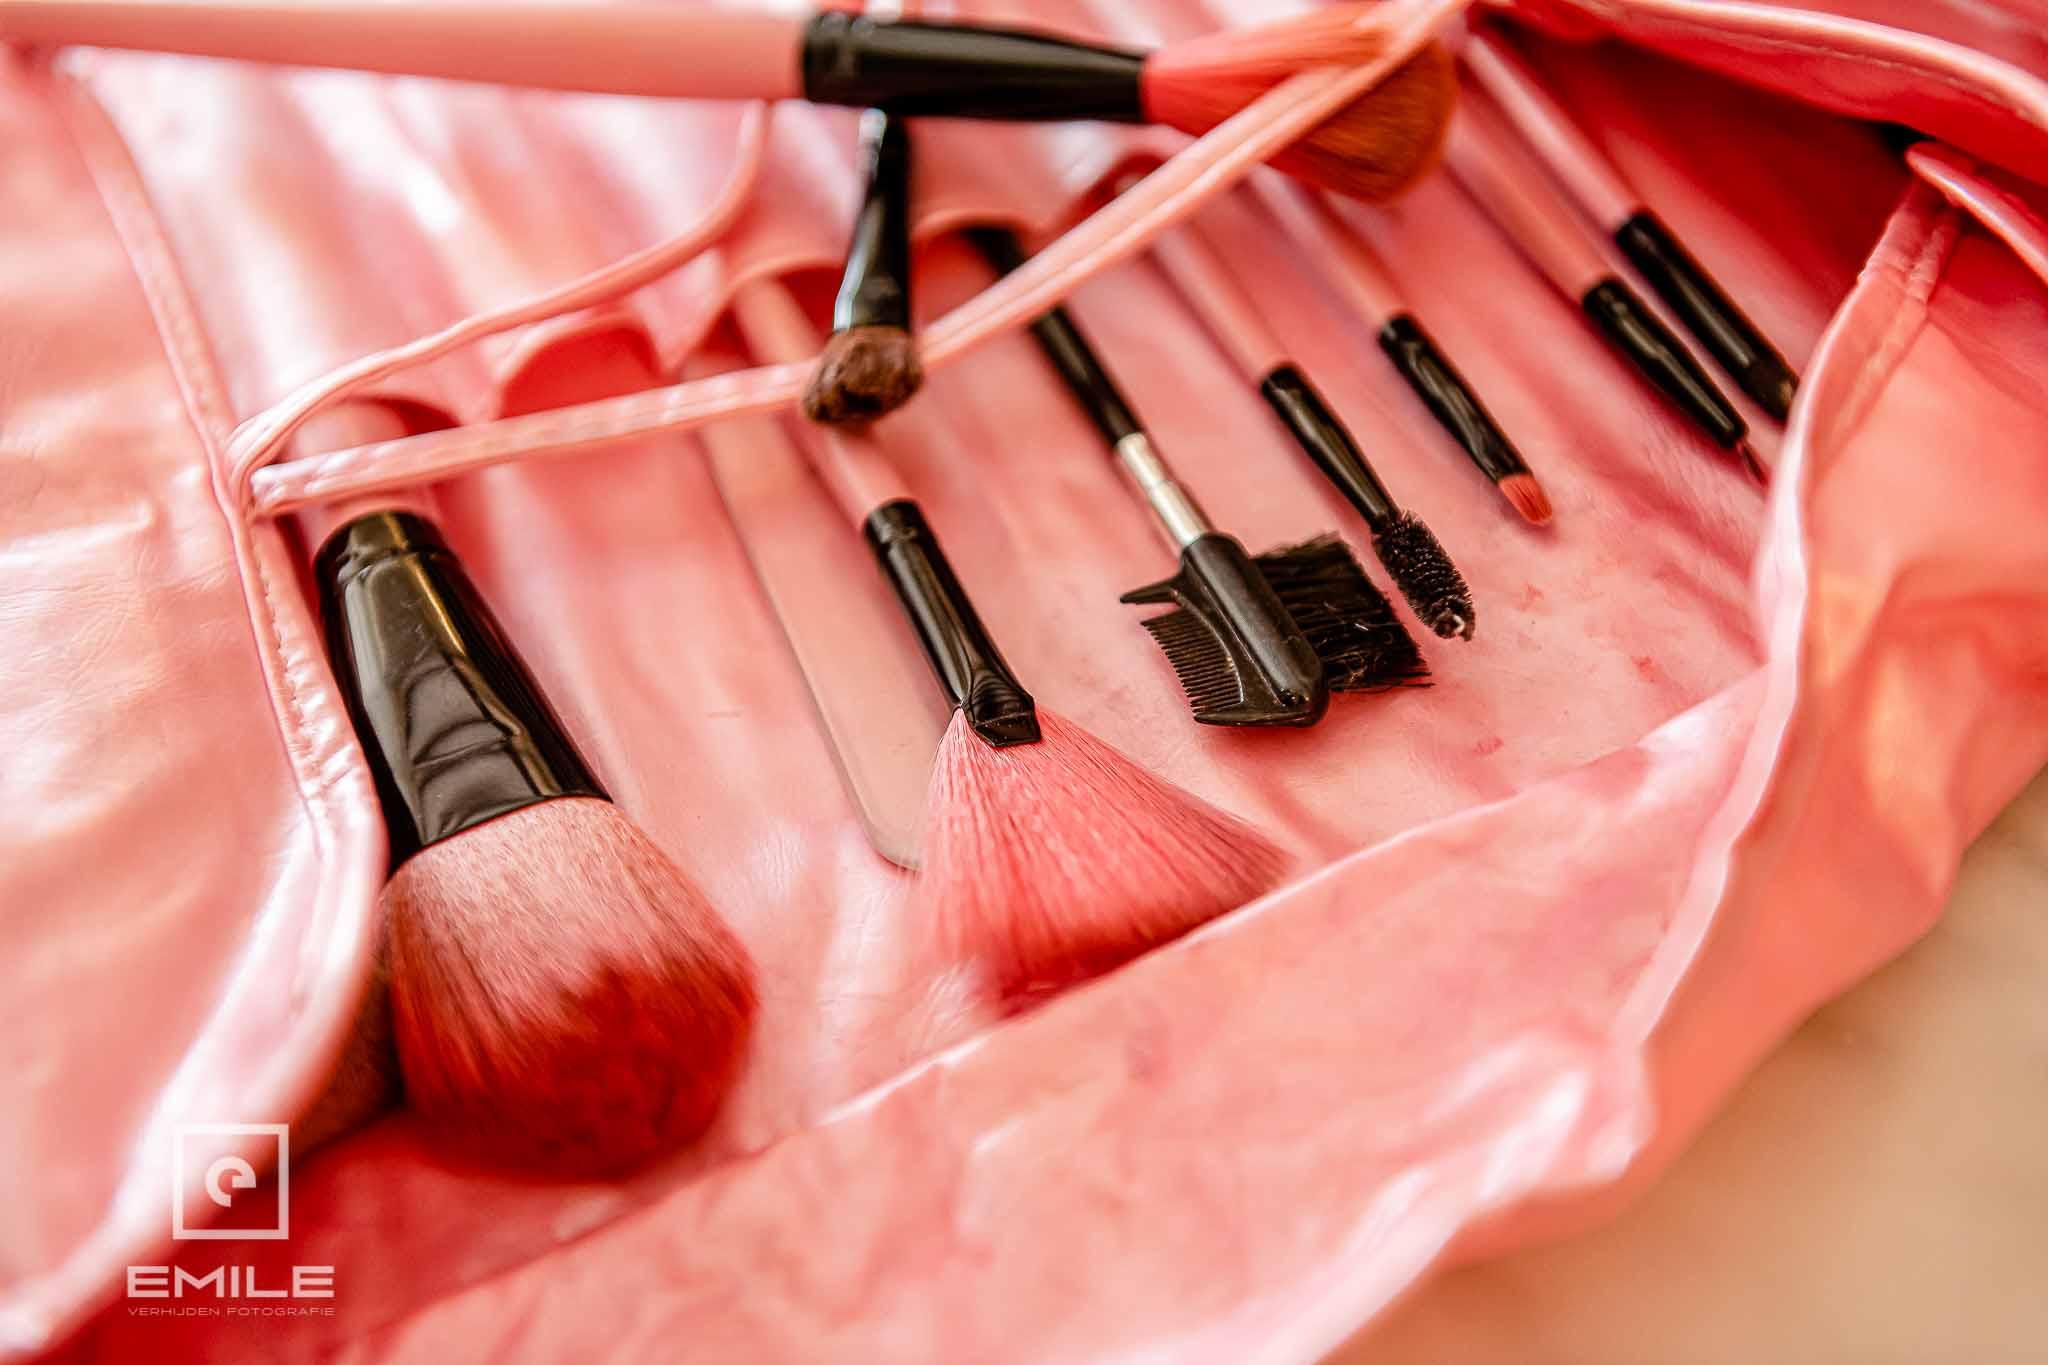 Closeup van make-up borsteltjes - Destination wedding San Gimignano - Toscane Italie - Iris en Job